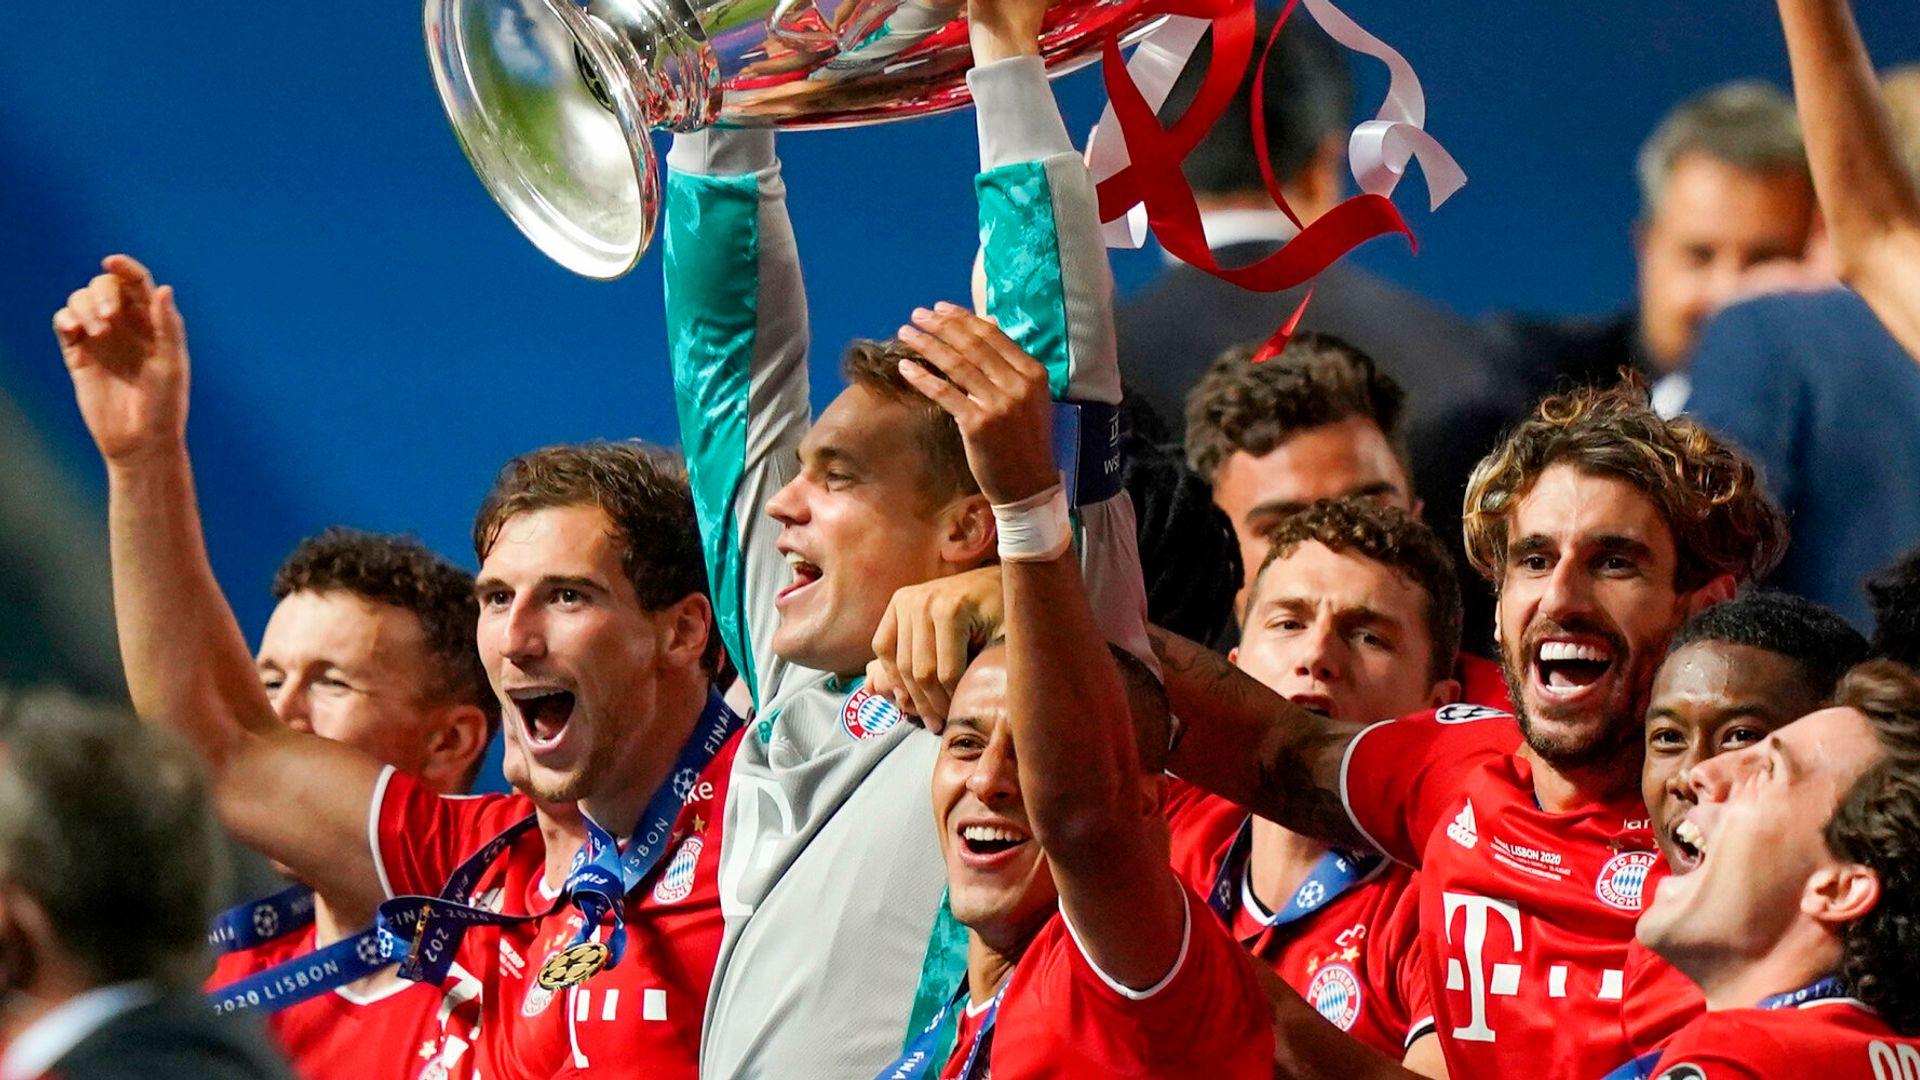 Champions League, Europa League draws & schedule